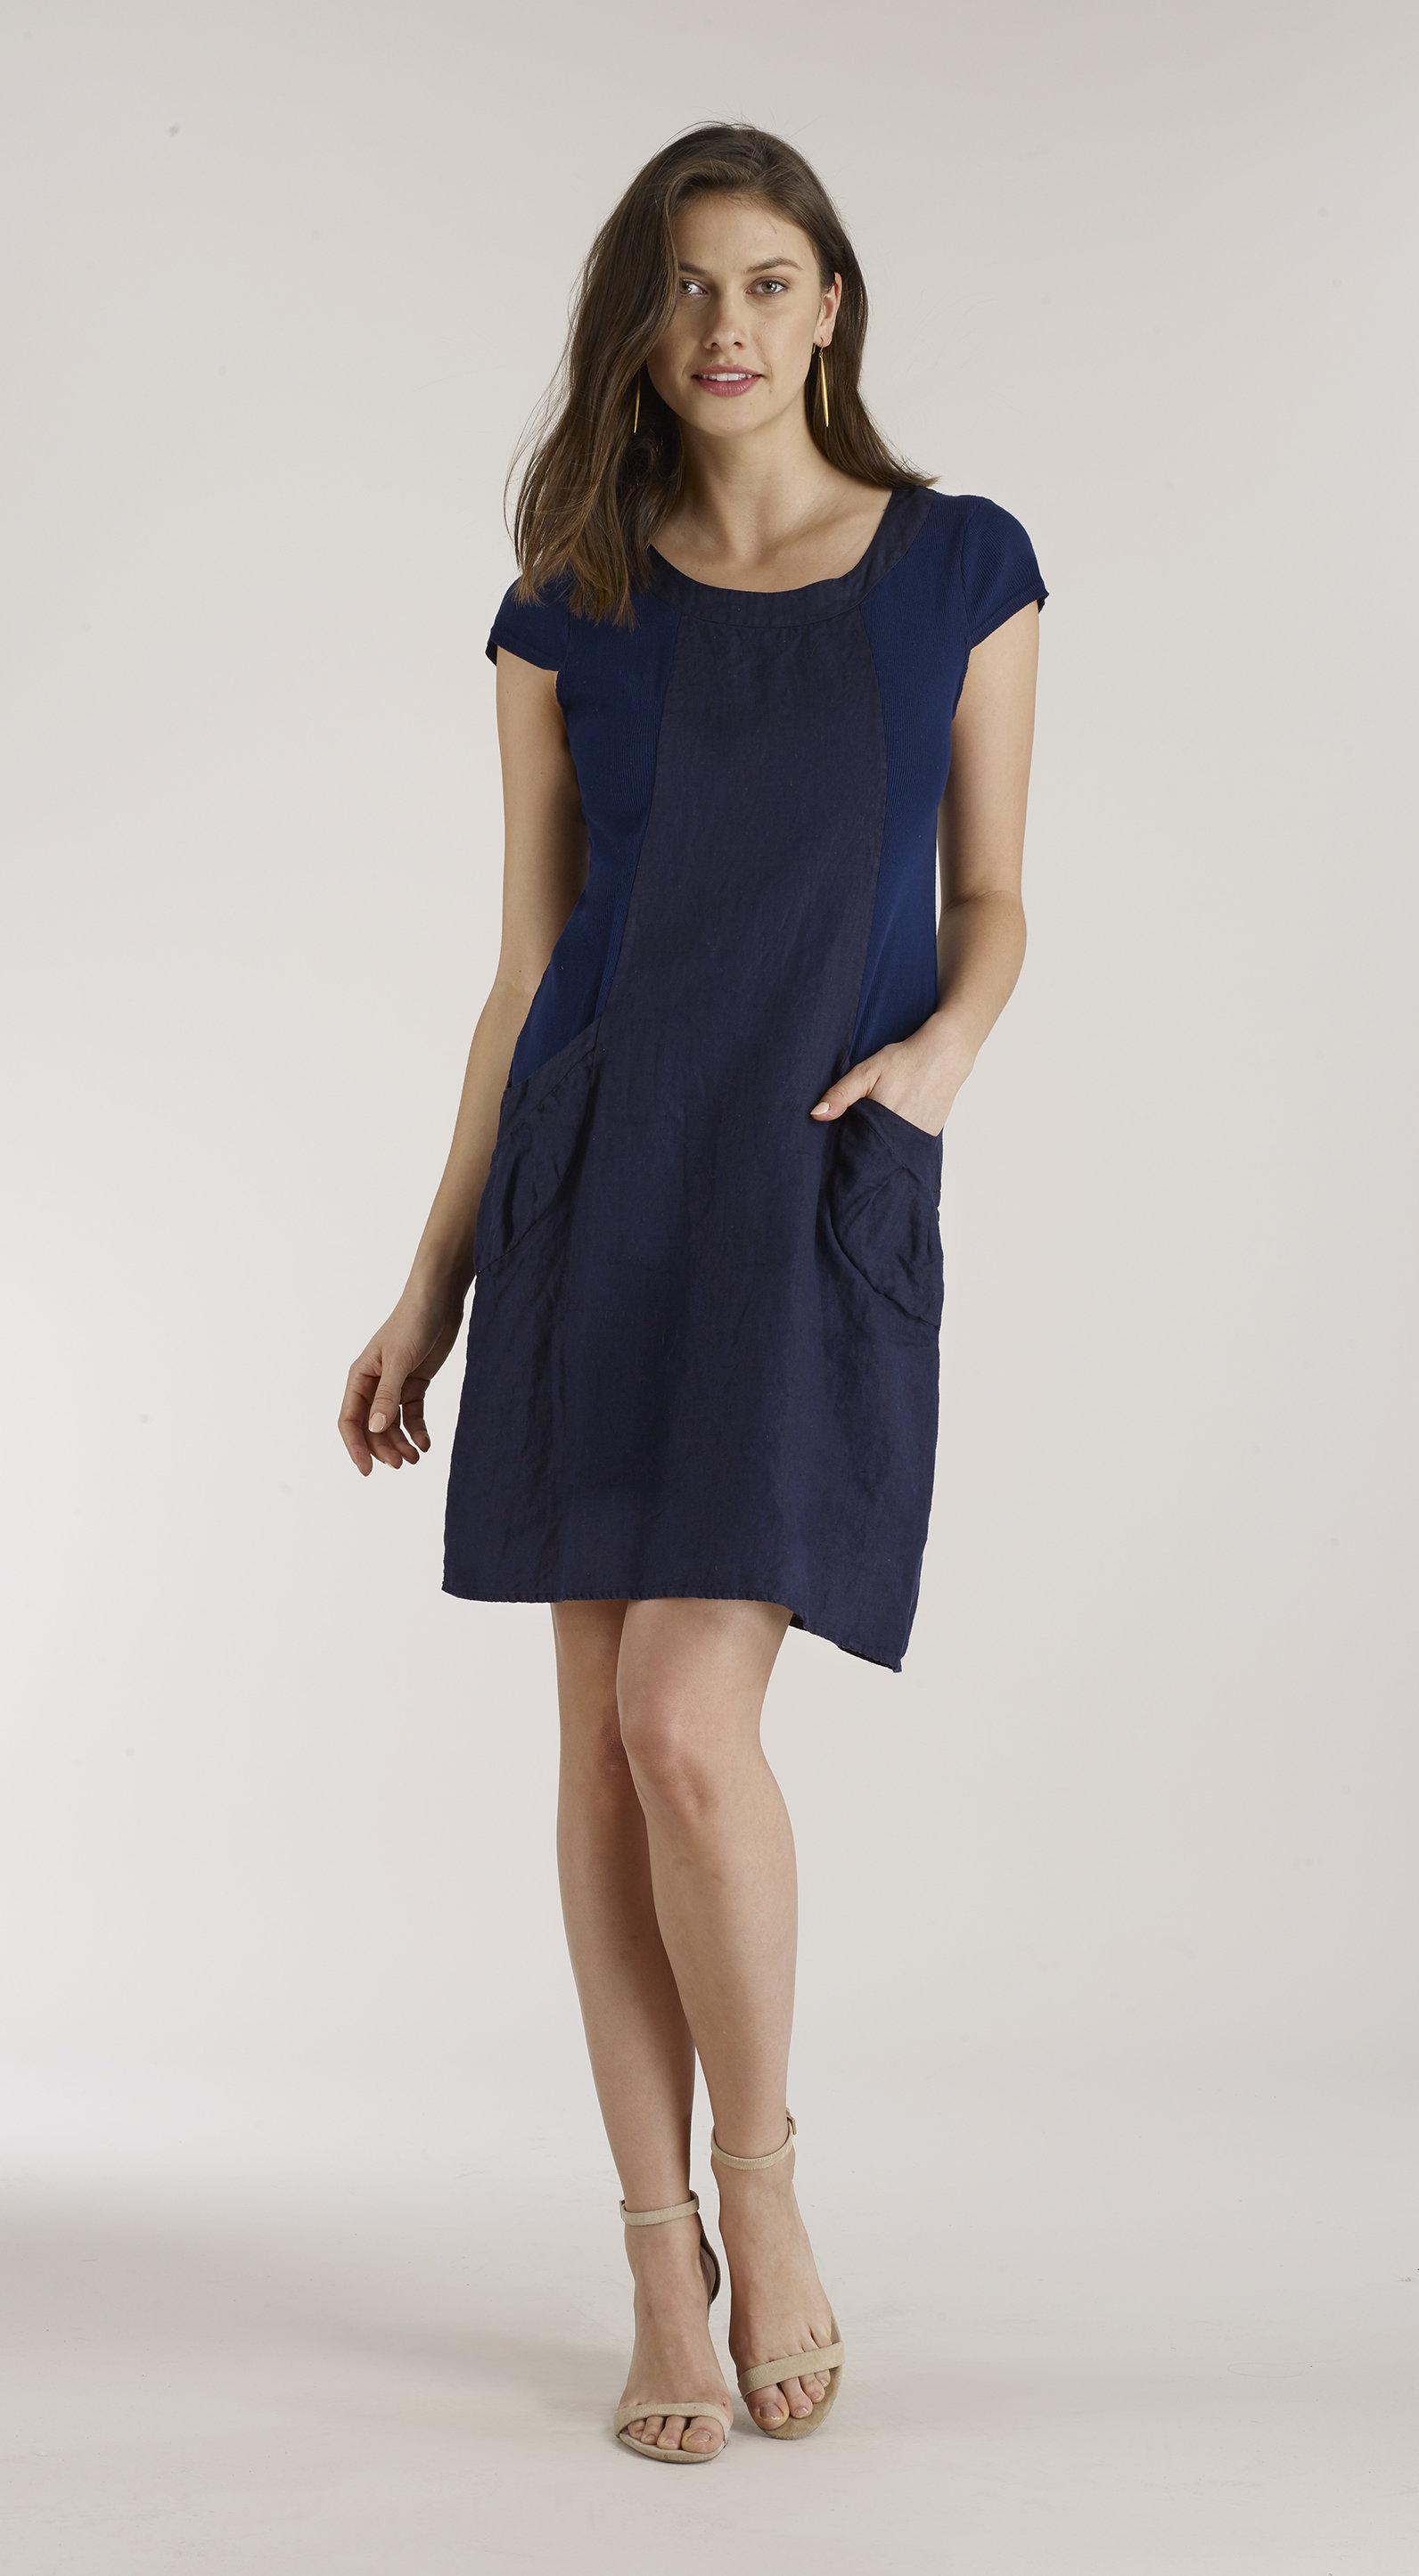 Luna Luz: Ribbed Linen & Cotton Capped Sleeve Dress (Ships Immed, 1 Left!) LL_764_N